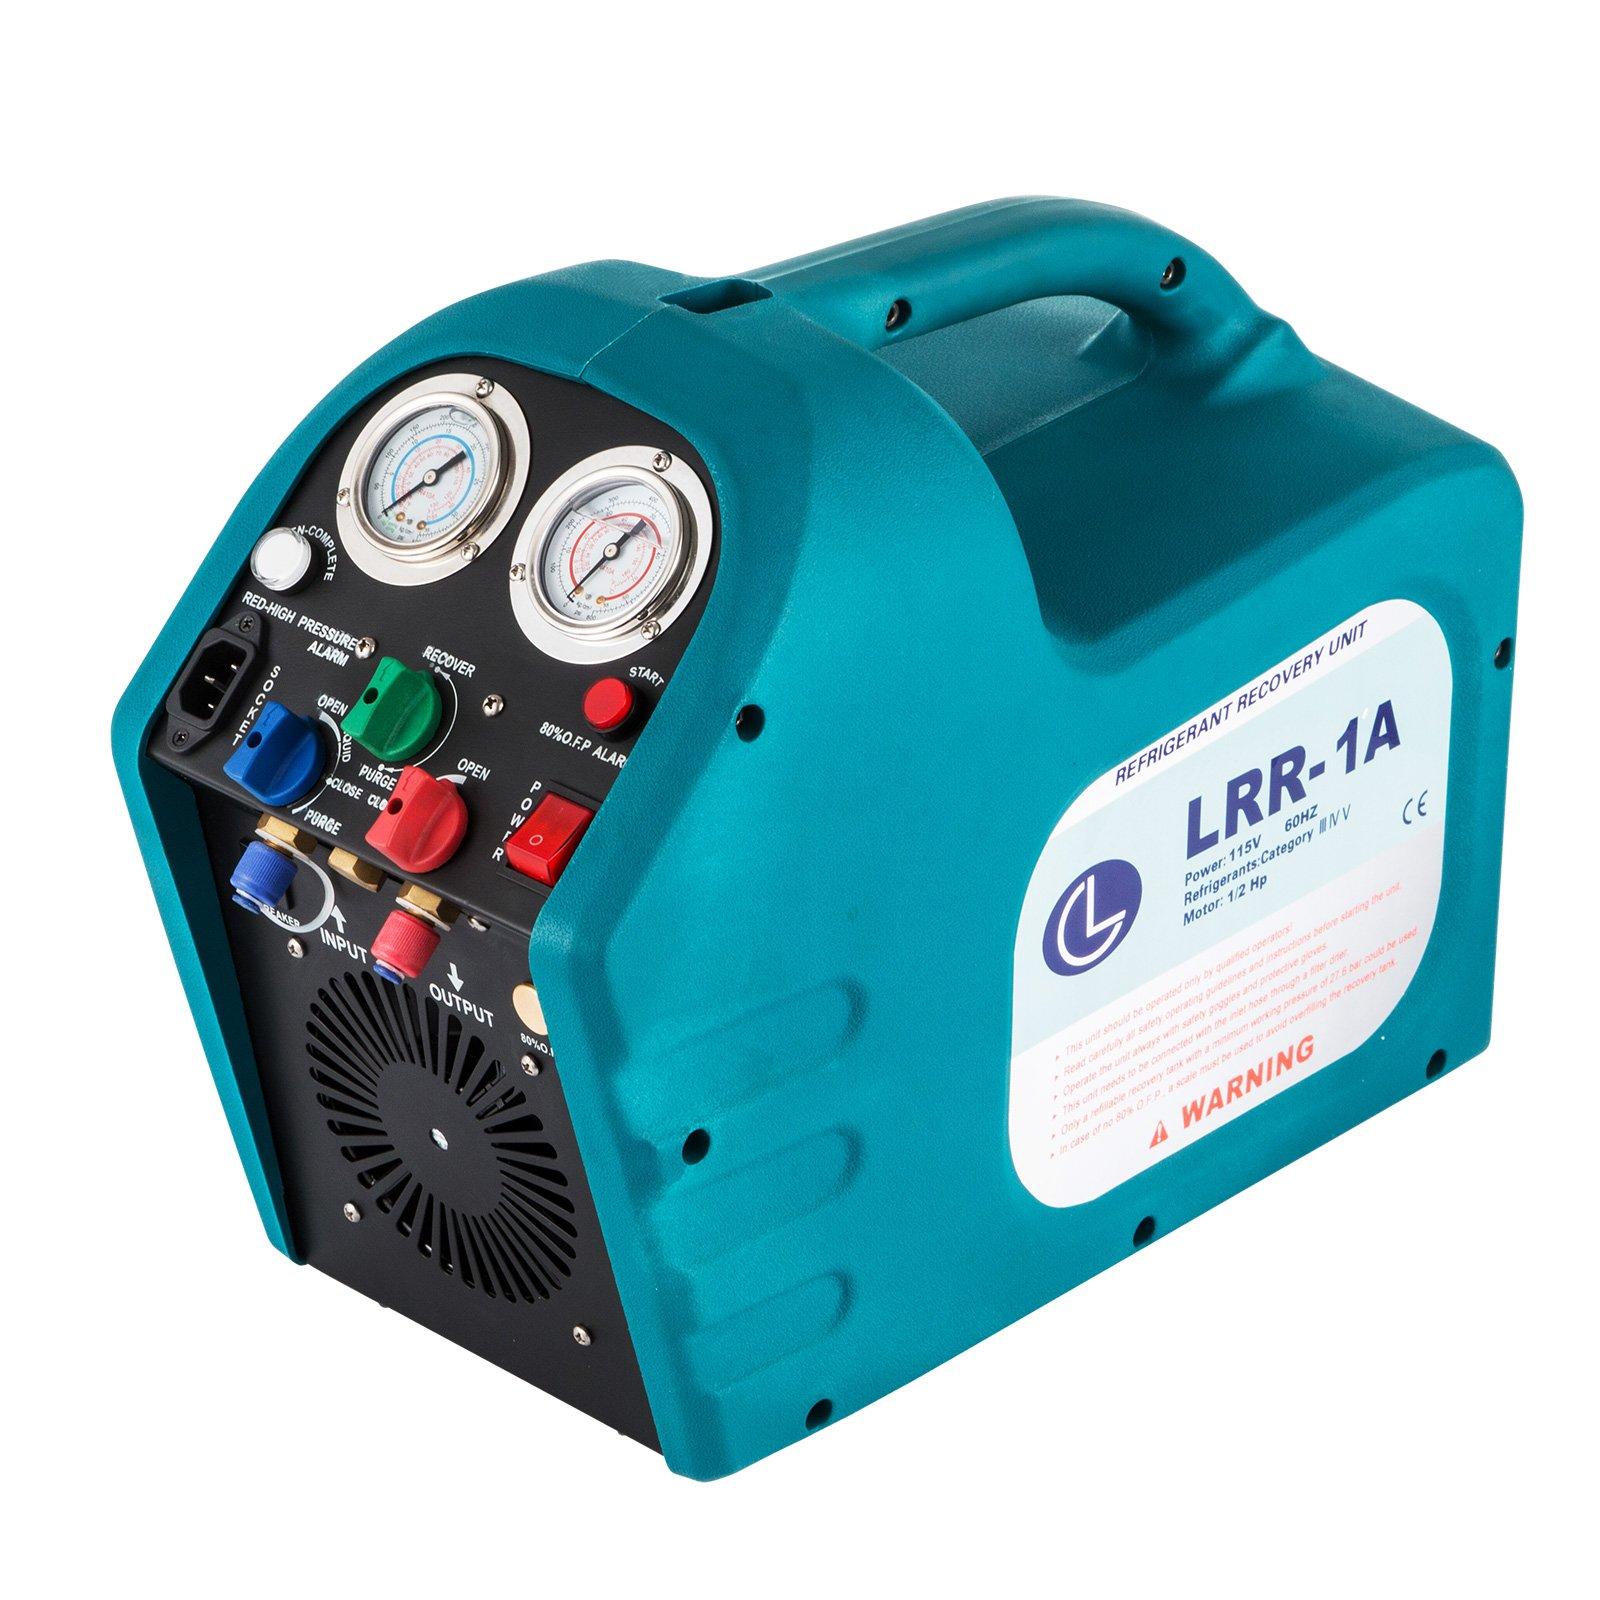 DreamJoy 1/2HP Refrigerant Recovery Machine Portable 110V AC Refrigerant Recycling Machine Automotive HVAC 558psi Refrigerant Recovery Unit Air Conditioning Repair Tool (110V)